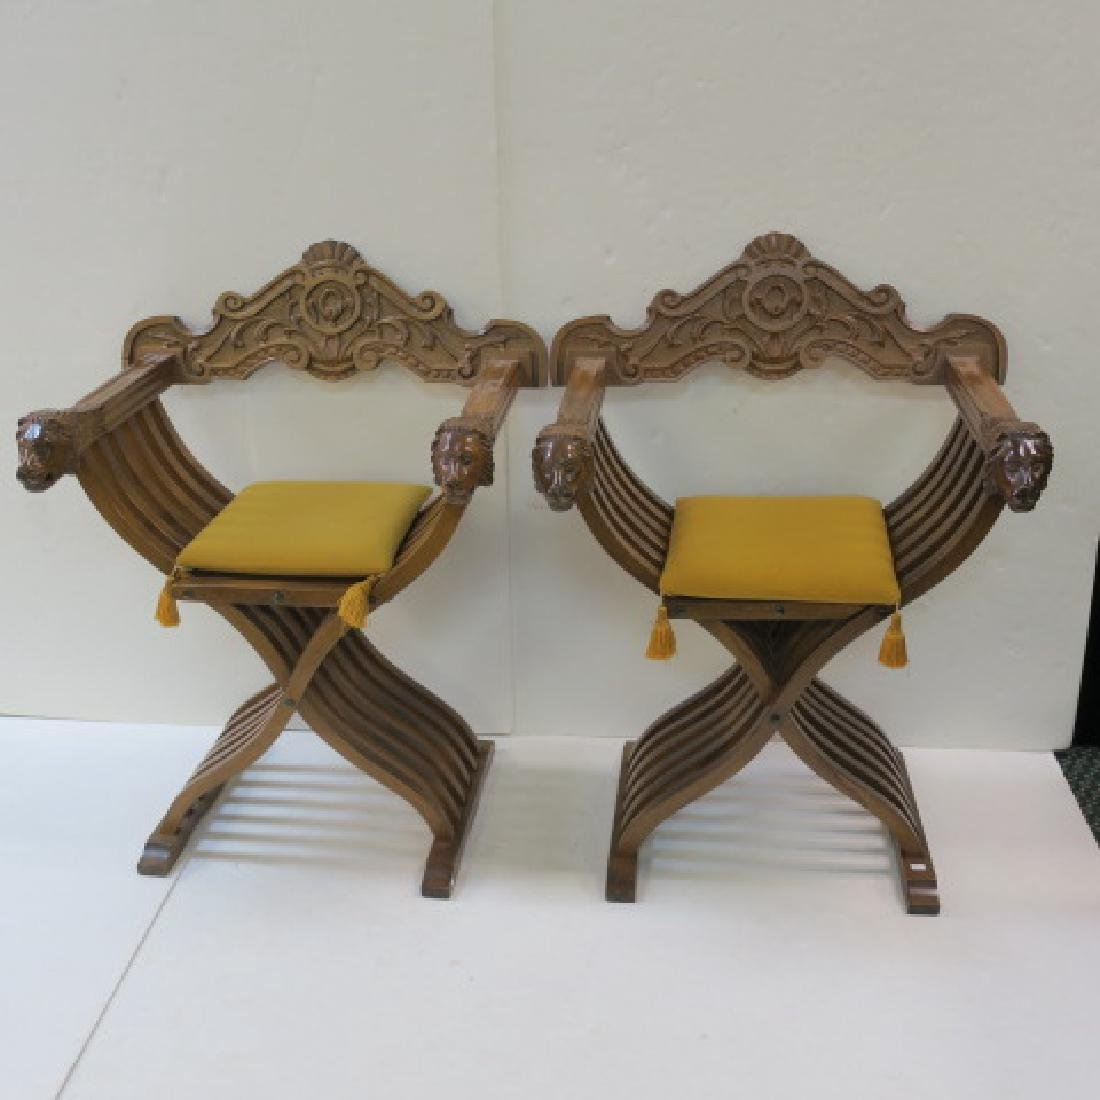 Pair of Italian Renaissance Style Savonarola Chairs: